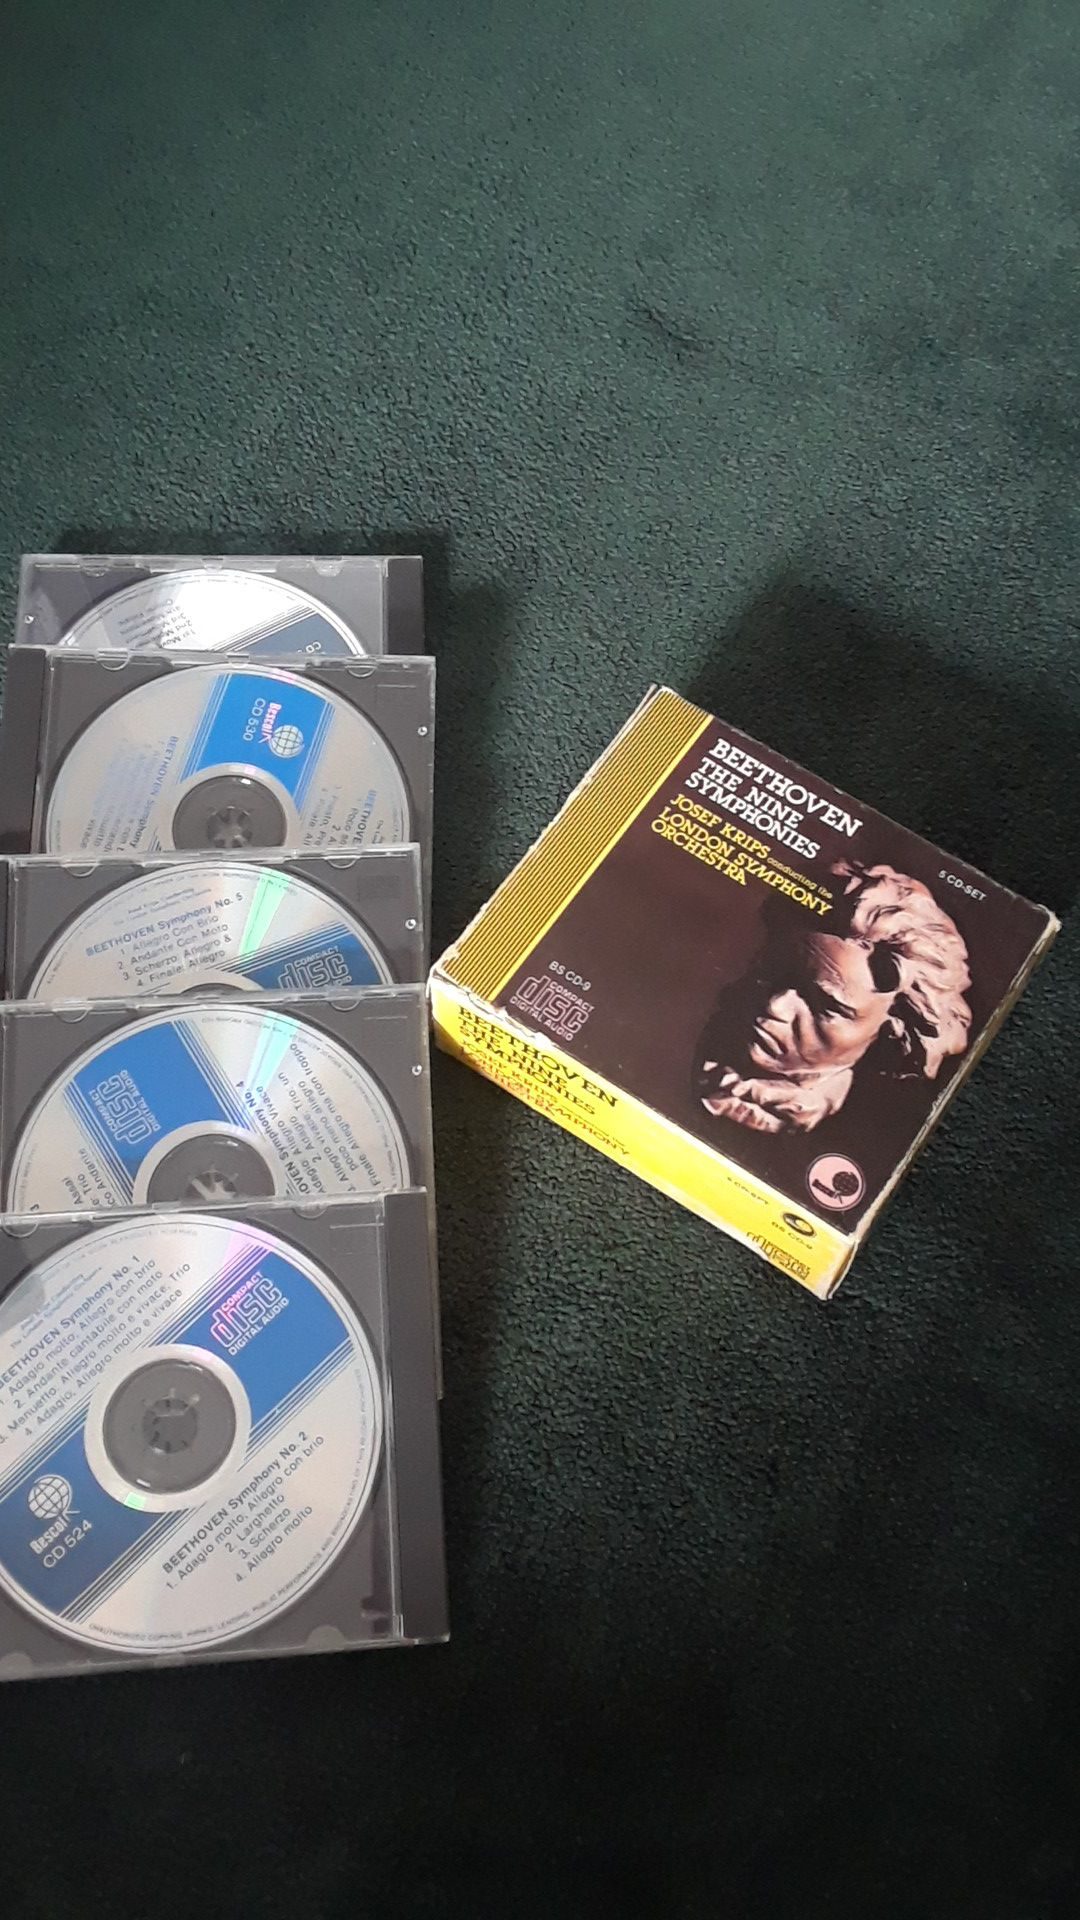 Beethoven 5-CD set